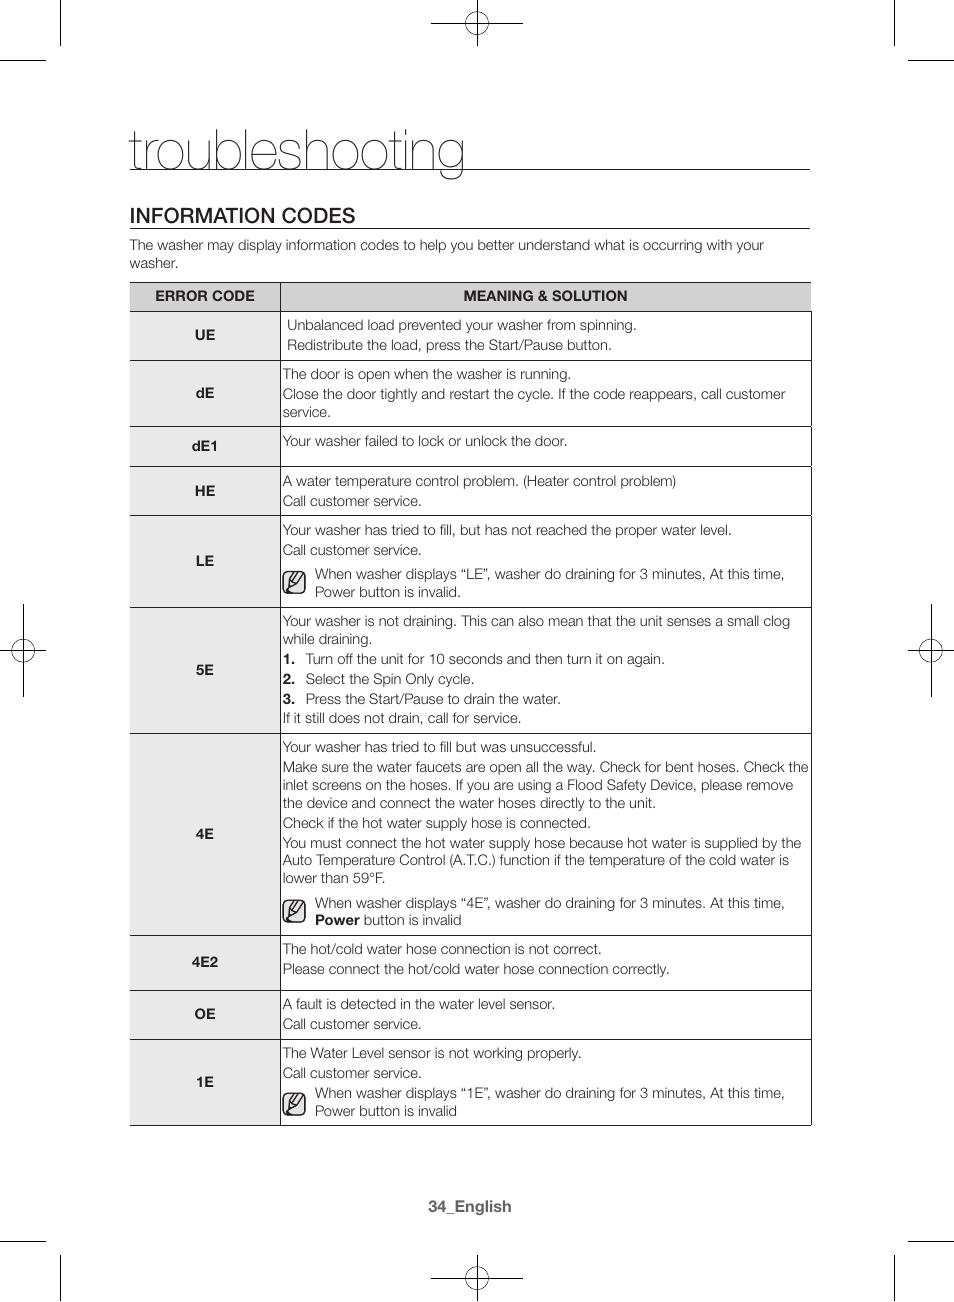 troubleshooting information codes samsung wf42h5600aw a2 user rh manualsdir com Samsung Rugby Samsung Refrigerator Troubleshooting Guide